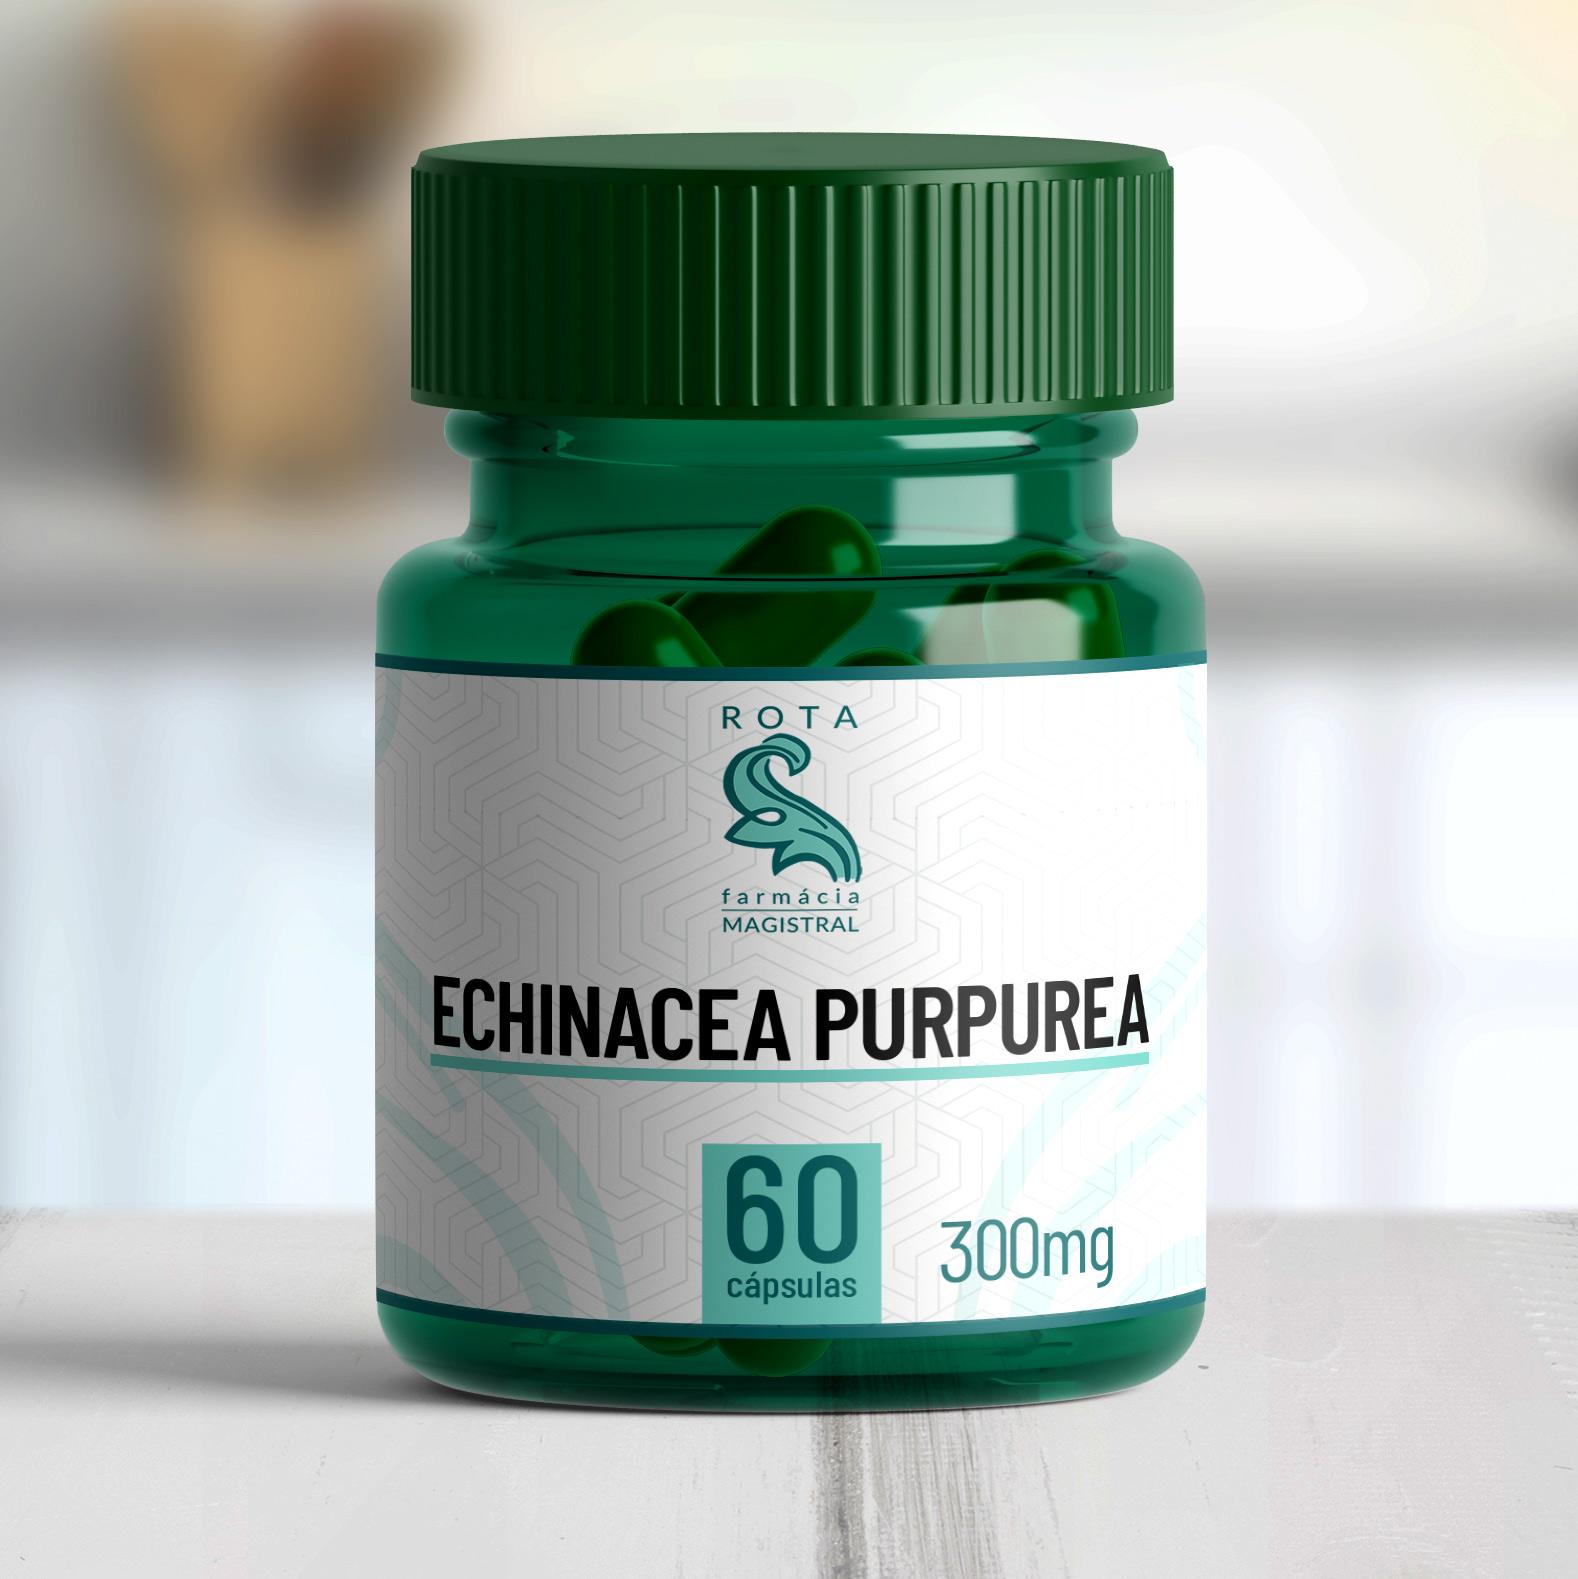 Echinacea Purpurea 300mg 60 cápsulas